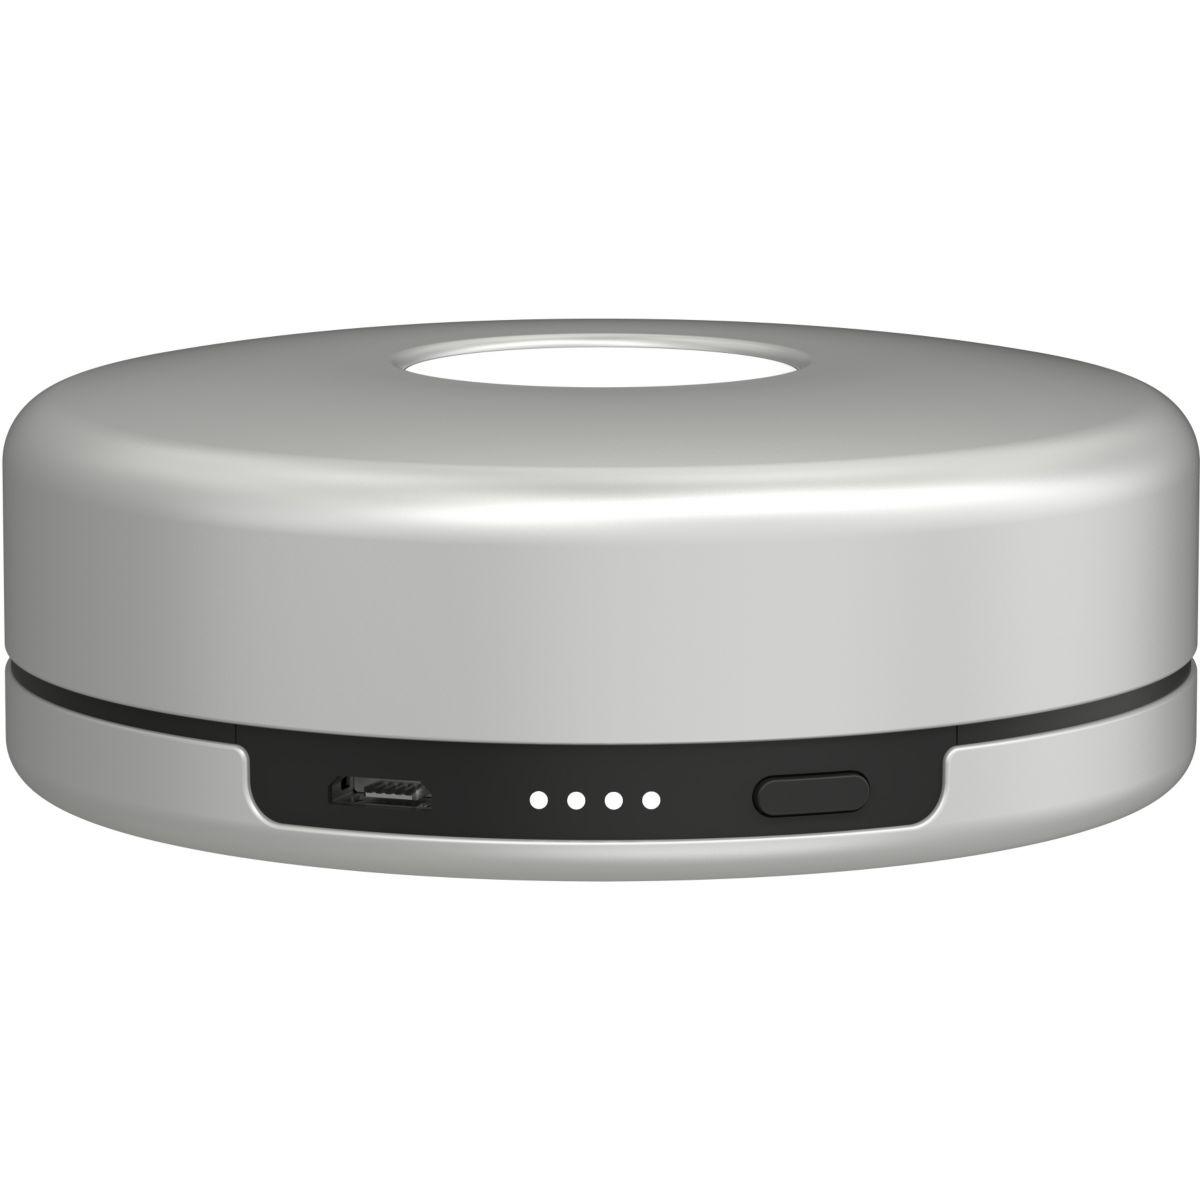 t l phonie gps chargeur induction nomad pod silver pour apple watch la s lection webdistrib. Black Bedroom Furniture Sets. Home Design Ideas